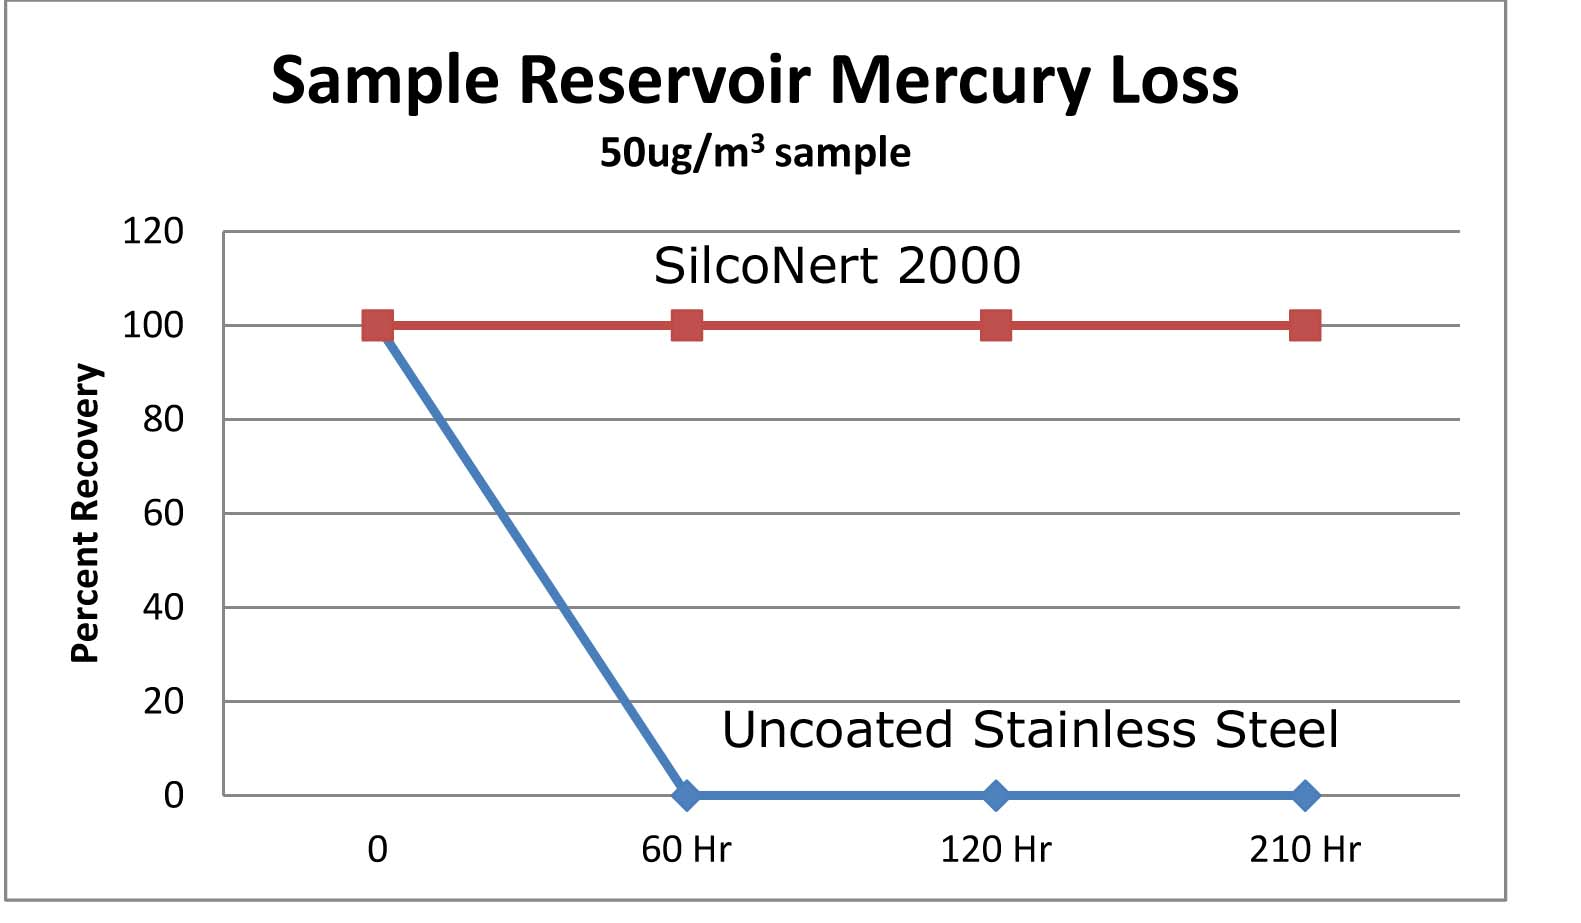 SLB_Mercury_Reservoir_loss_2_5_15